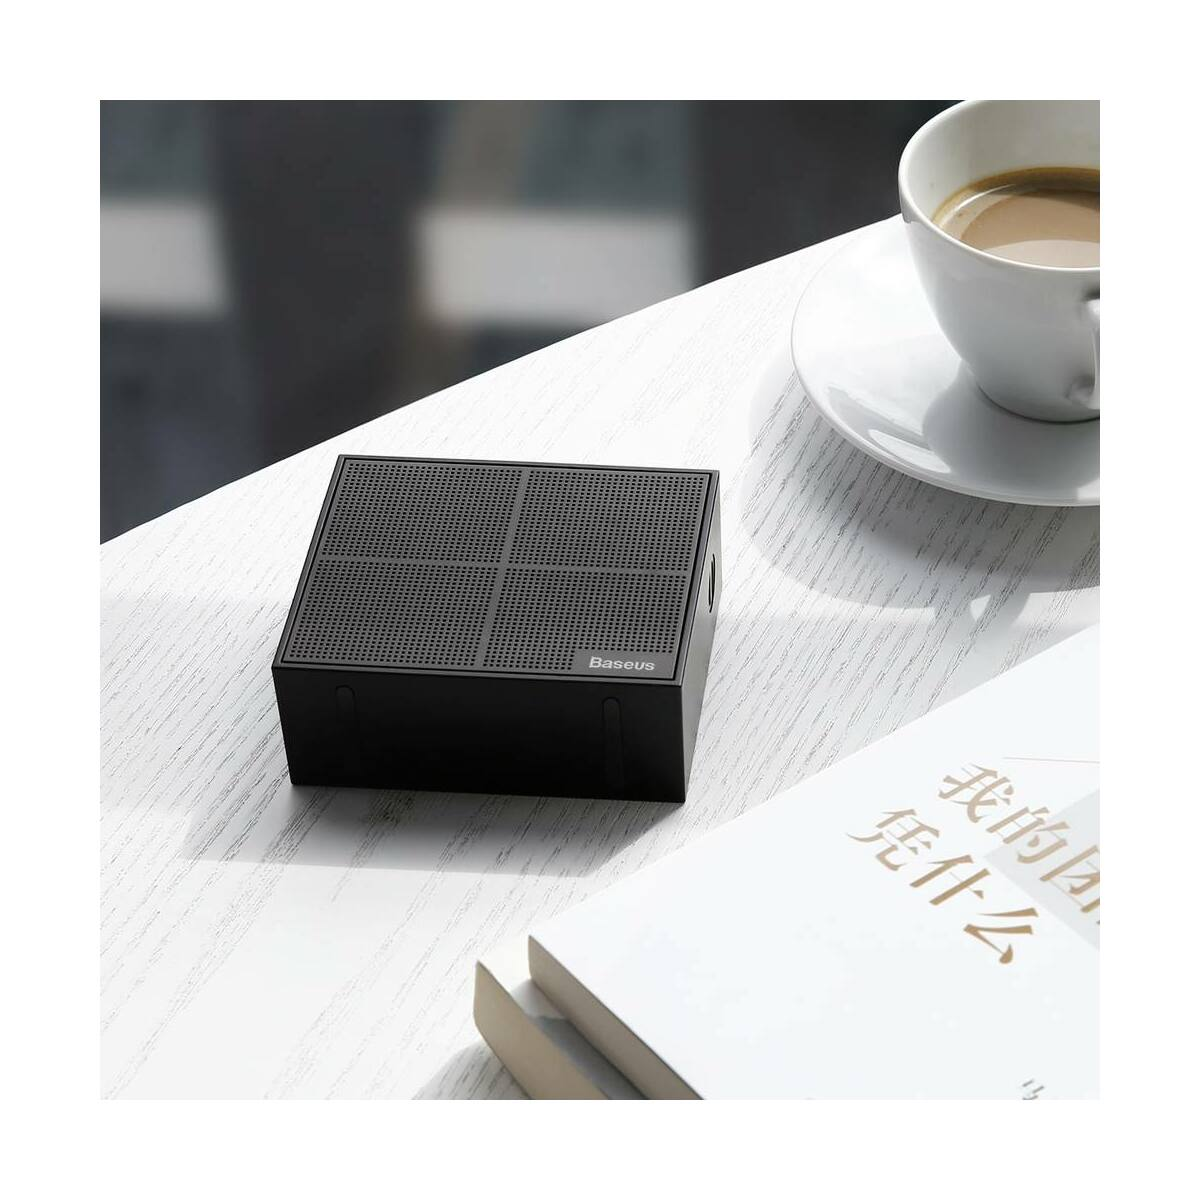 Baseus Hordozható hangszóró Bluetooth Encok E05 Music-cube, fekete (NGE05-01)